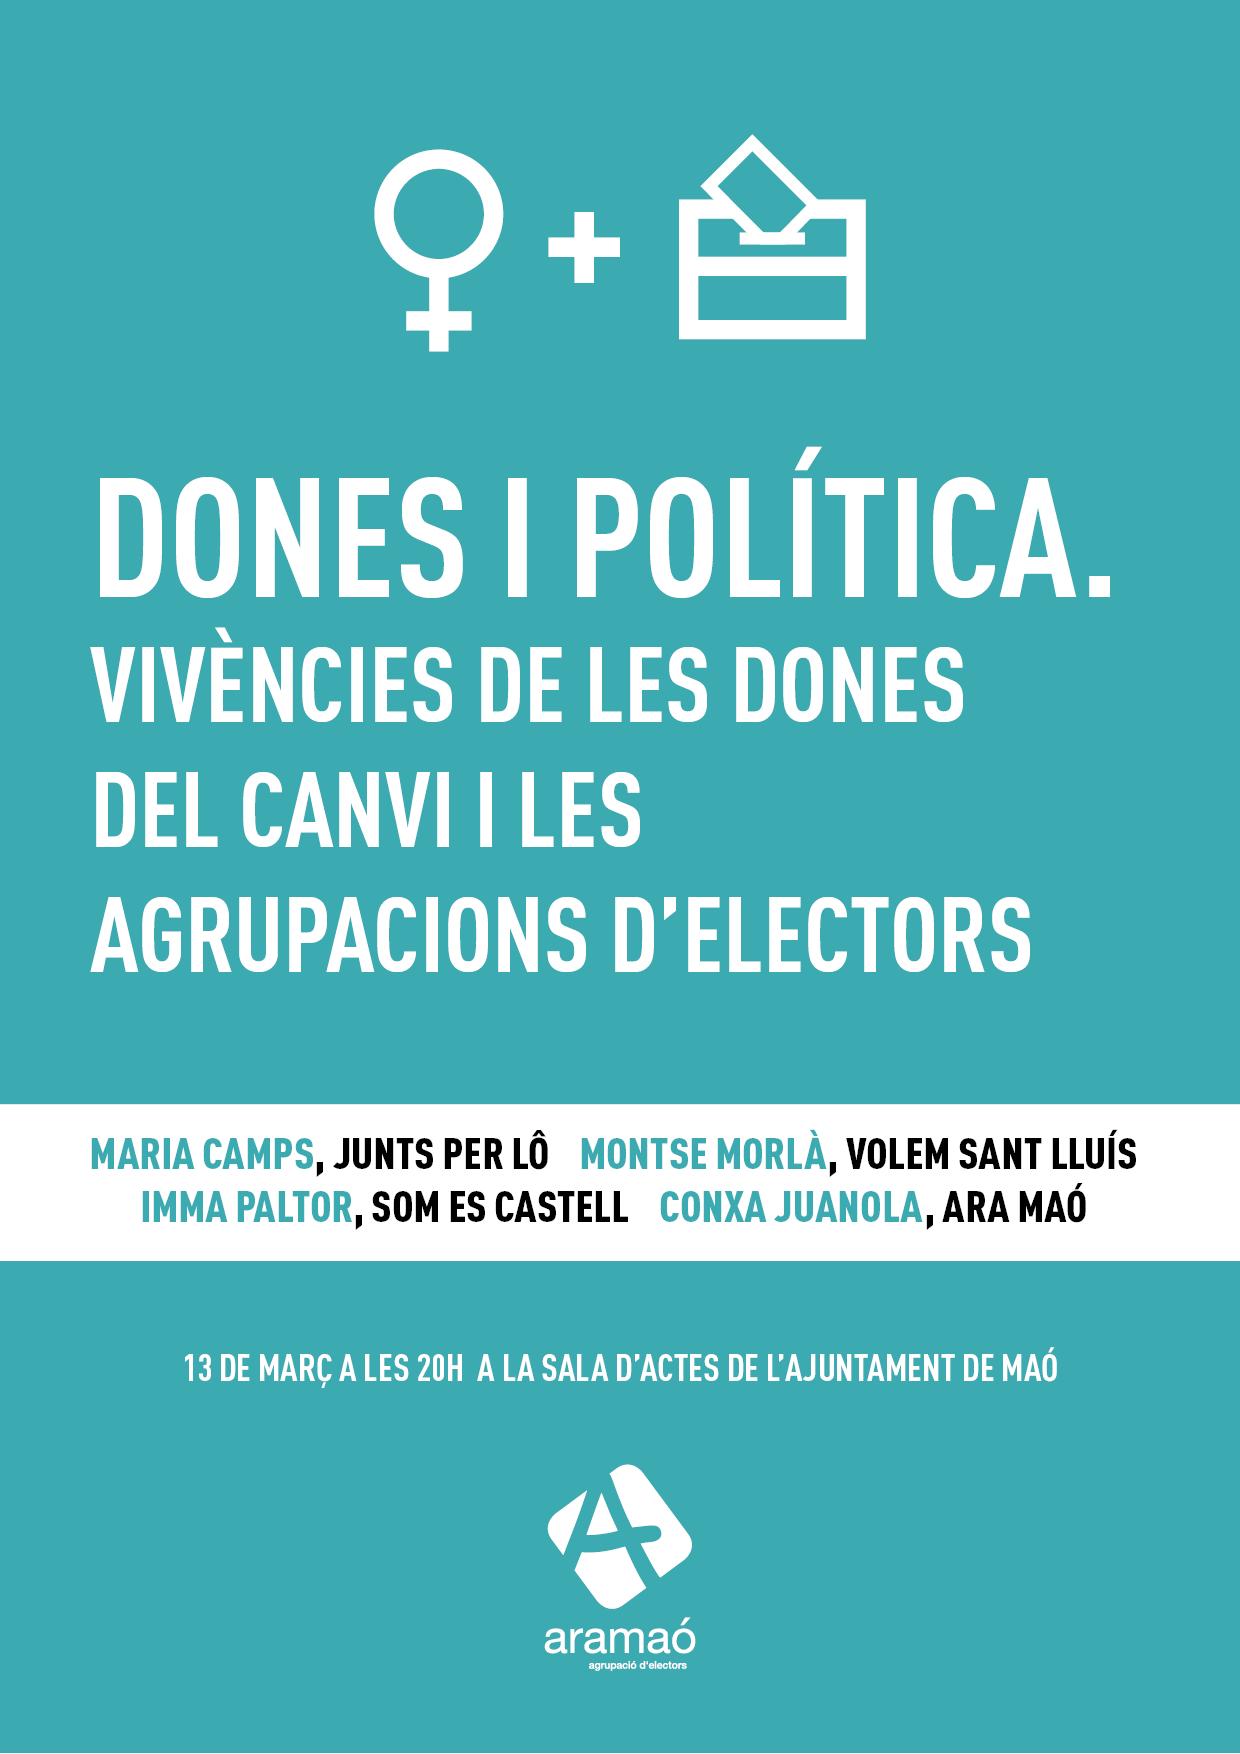 cartell dones i política